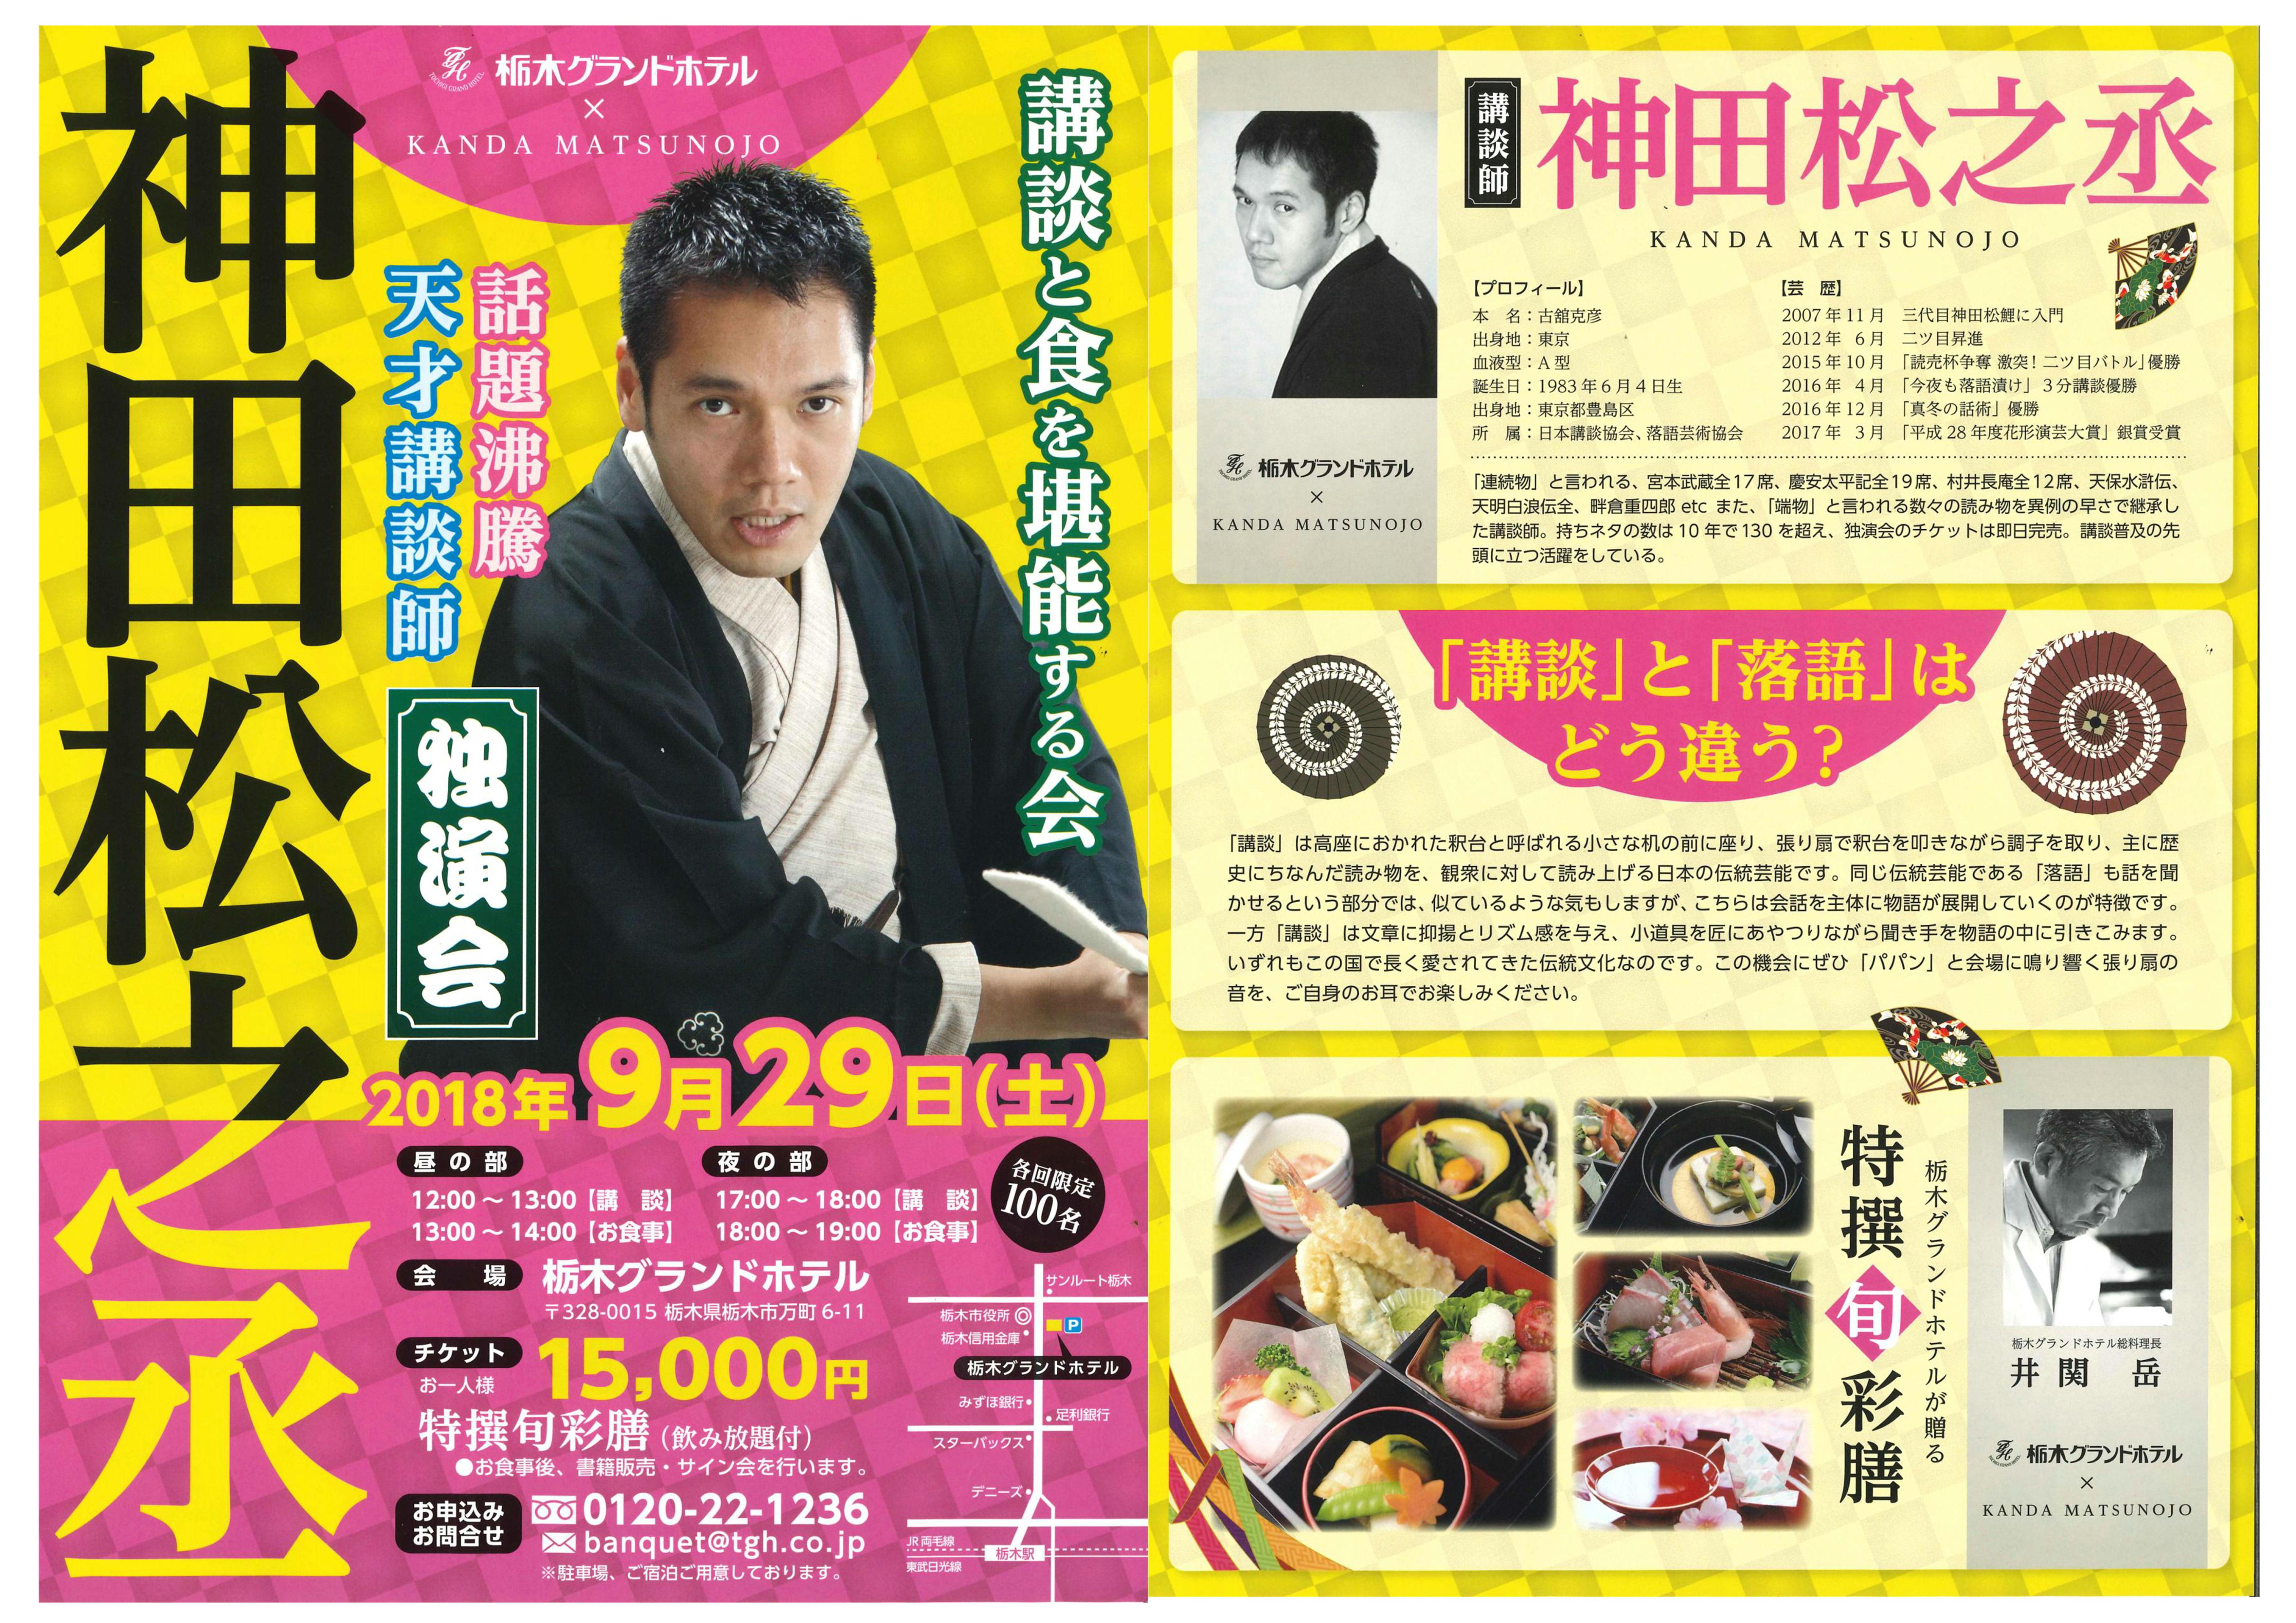 http://www.tgh.co.jp/contents/news/%E3%83%81%E3%83%A9%E3%82%B7.JPG